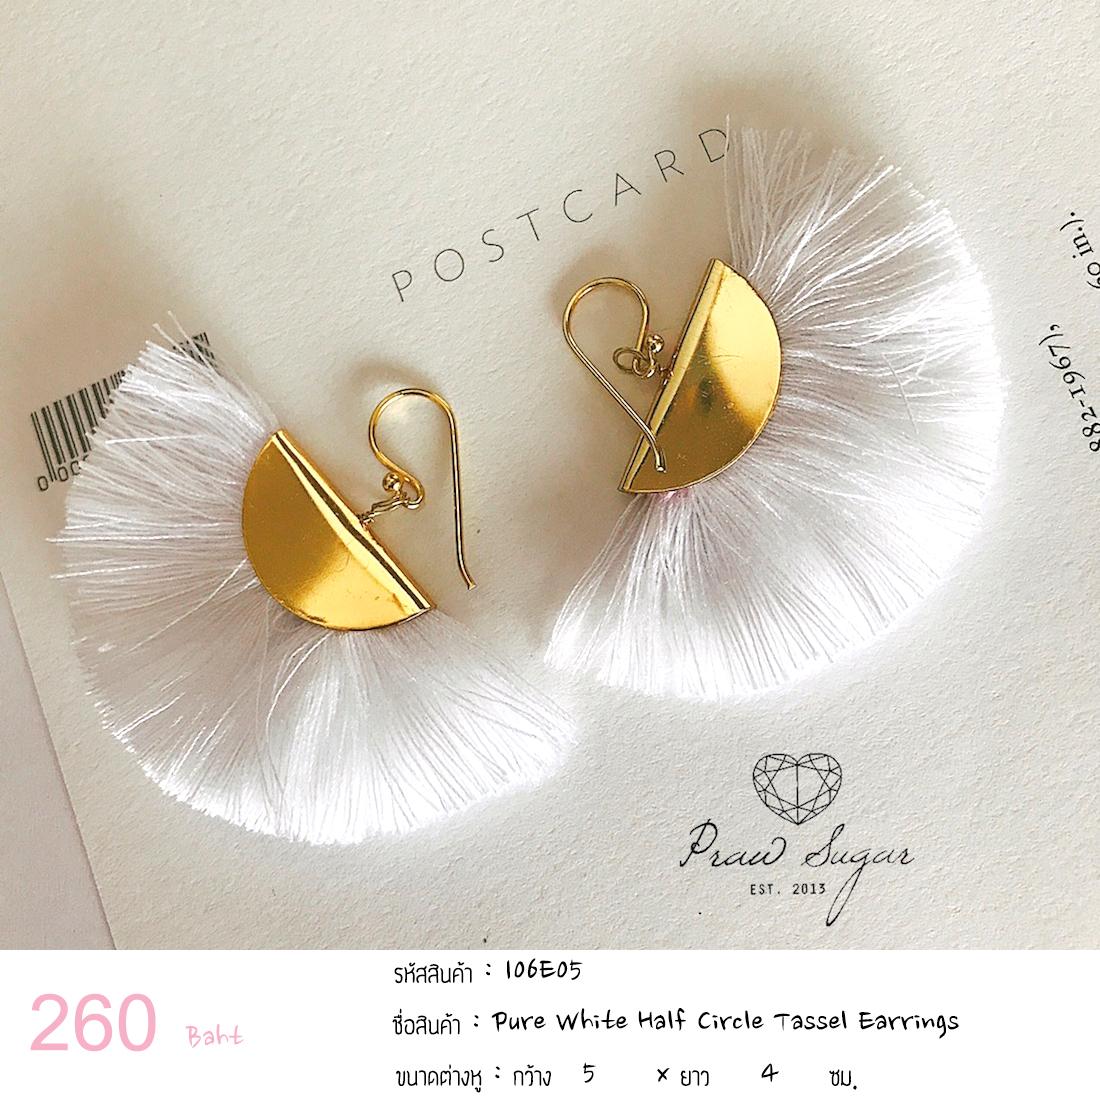 Pure White Half Circle Tassel Earrings